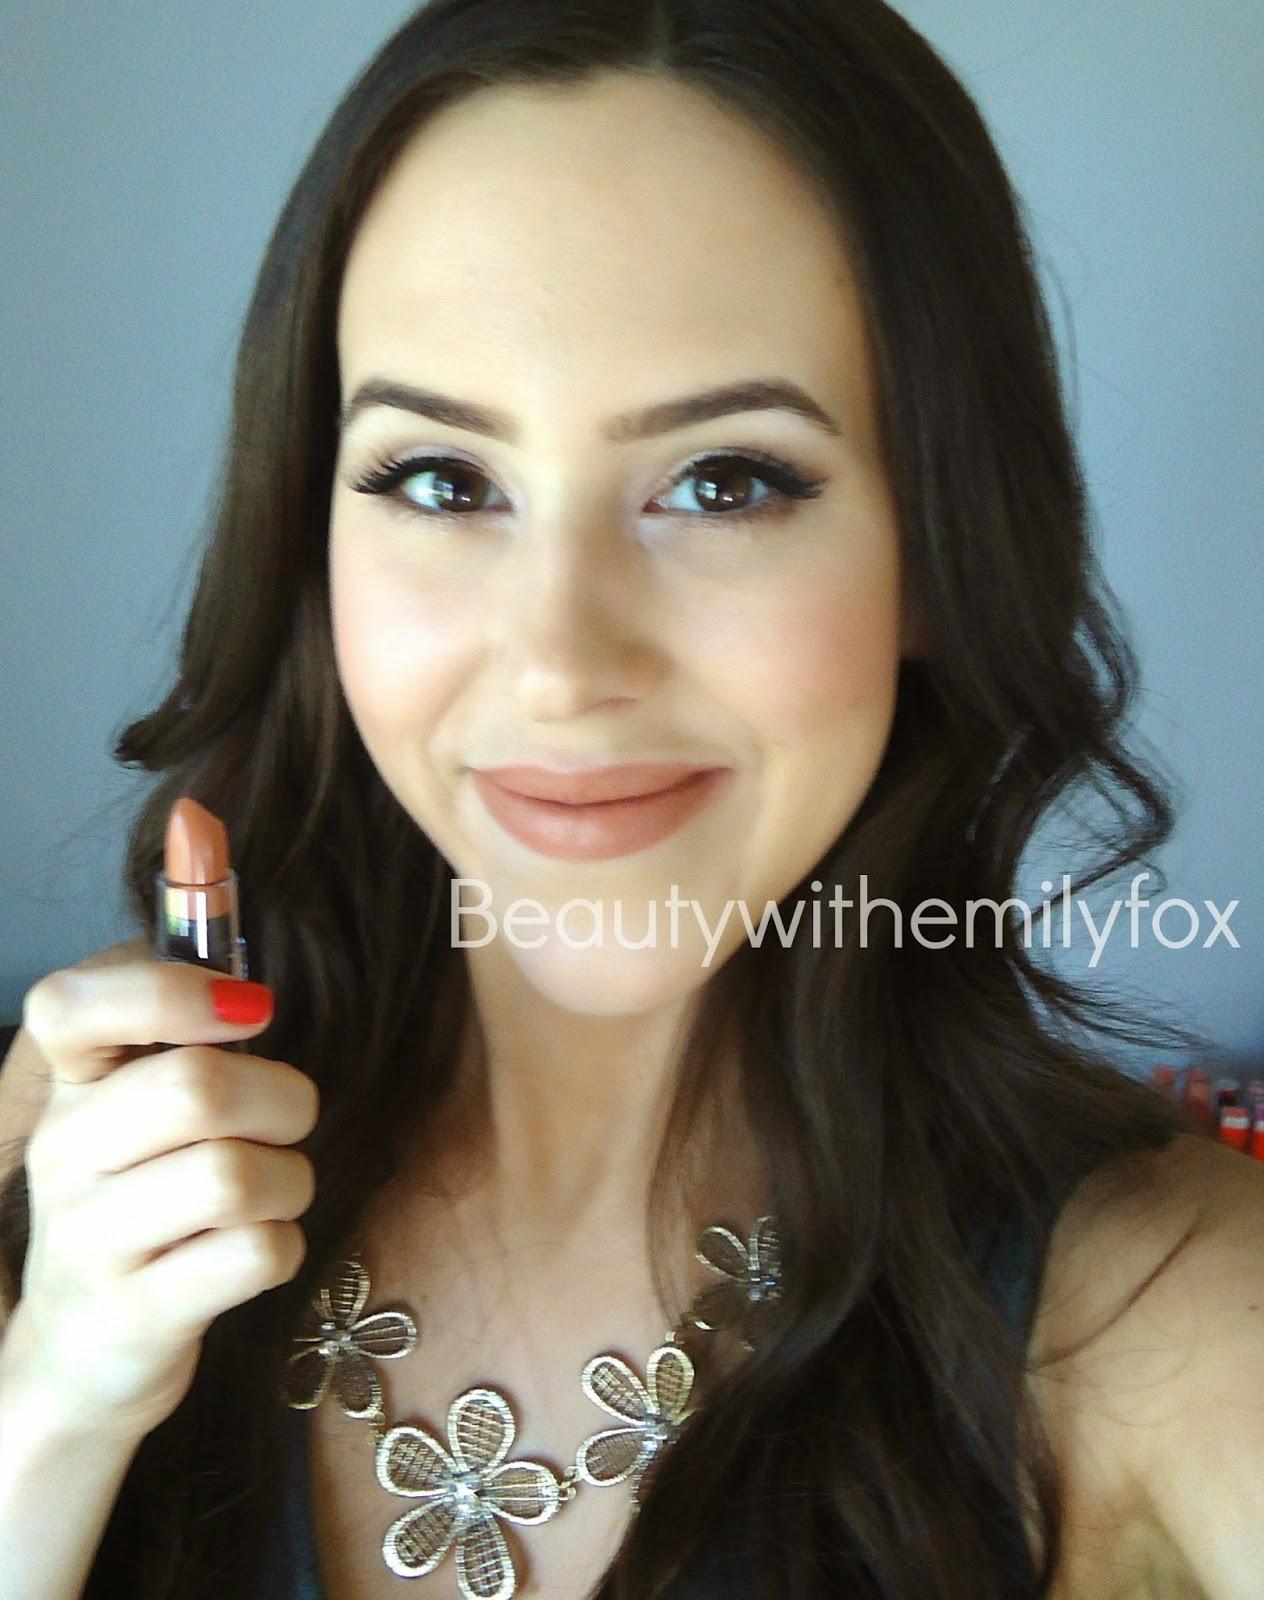 Beautywithemilyfox: NYX Matte Lipsticks - New Shades 2014